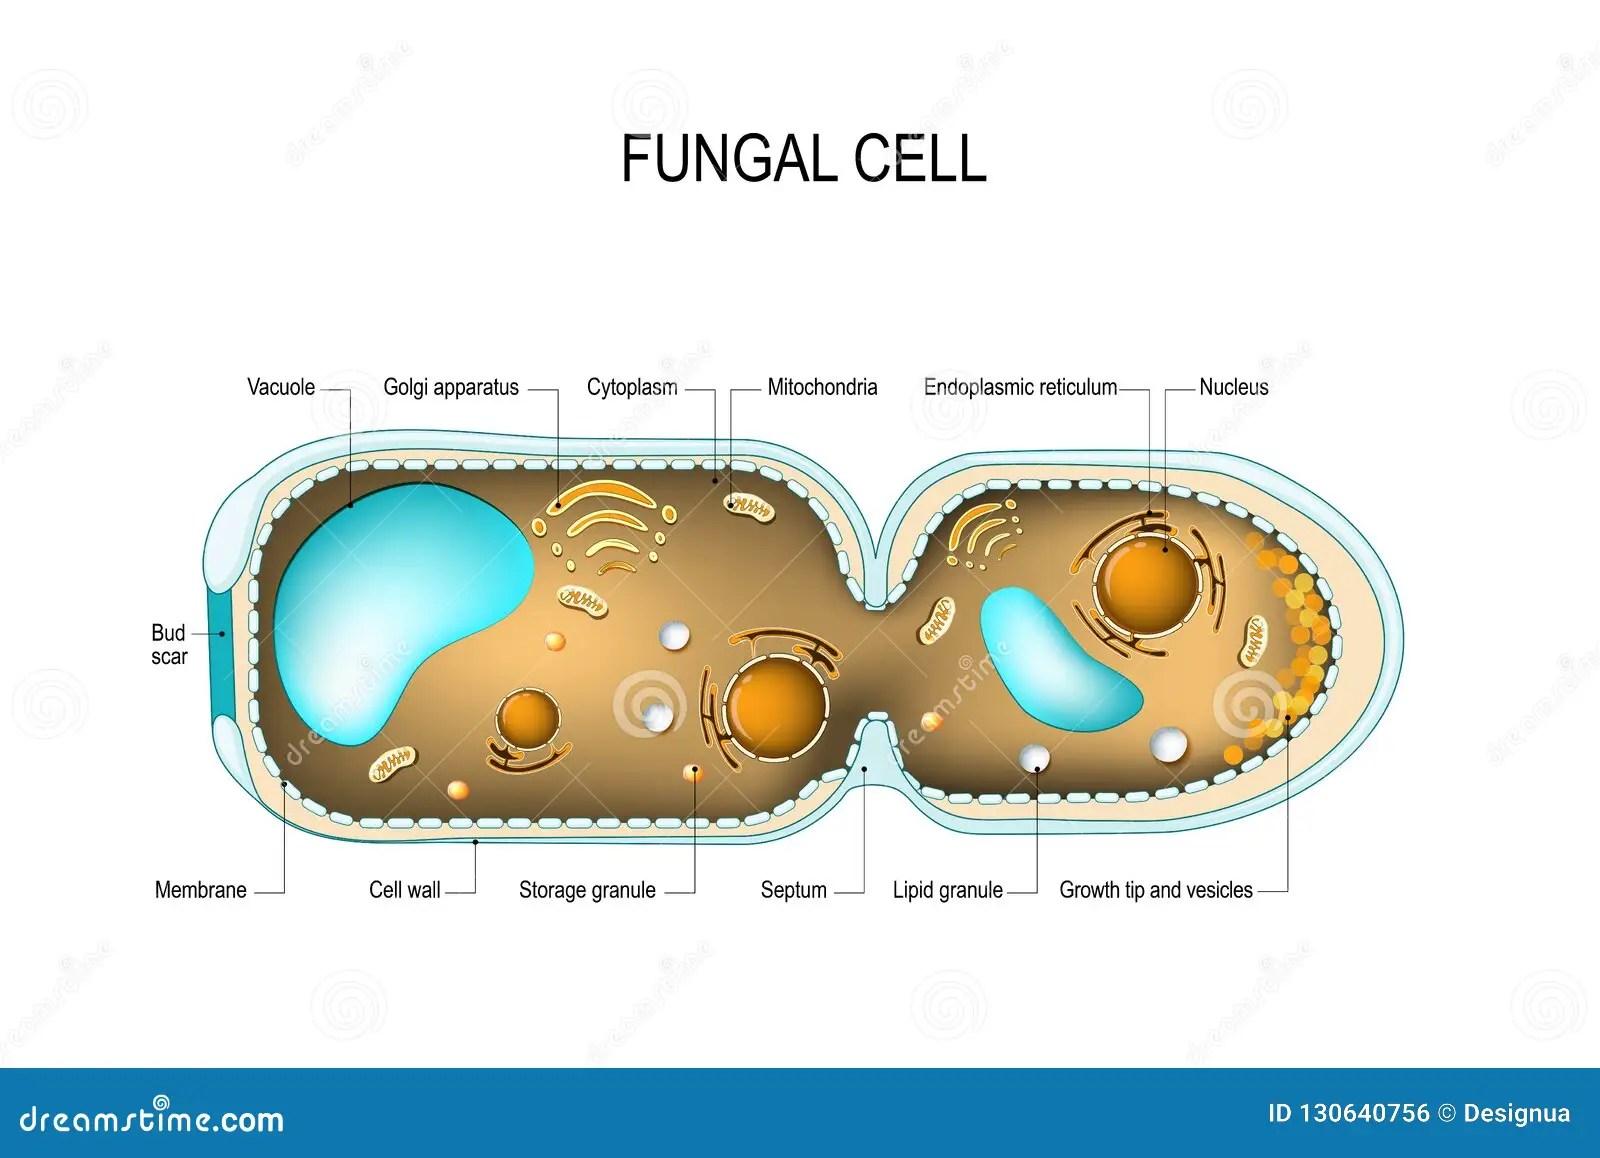 hight resolution of cross section of a fungal hyphae cells septum bud scar mitochondrion vacuole nucleus endoplasmic reticulum lipid granule membrane golgi apparatus